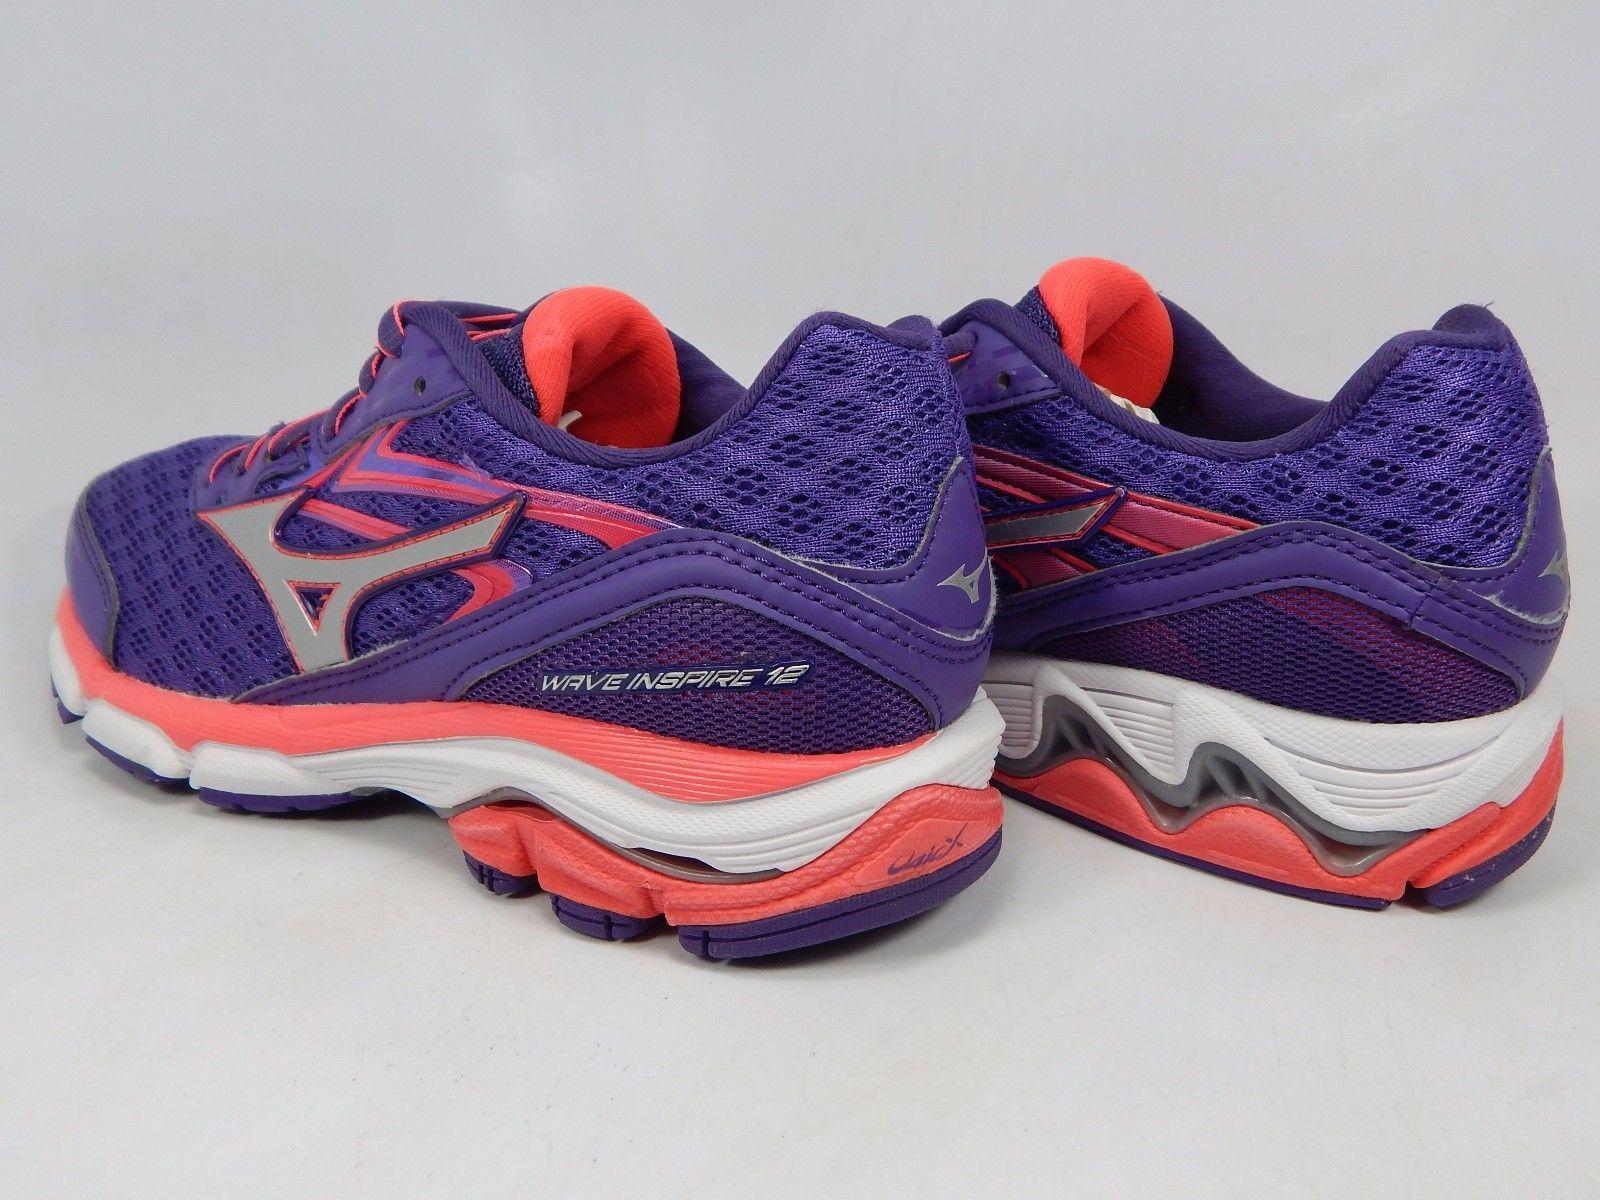 Mizuno Wave Inspire 12 Women's Running Shoes Size US 8 D WIDE EU 38.5 Purple